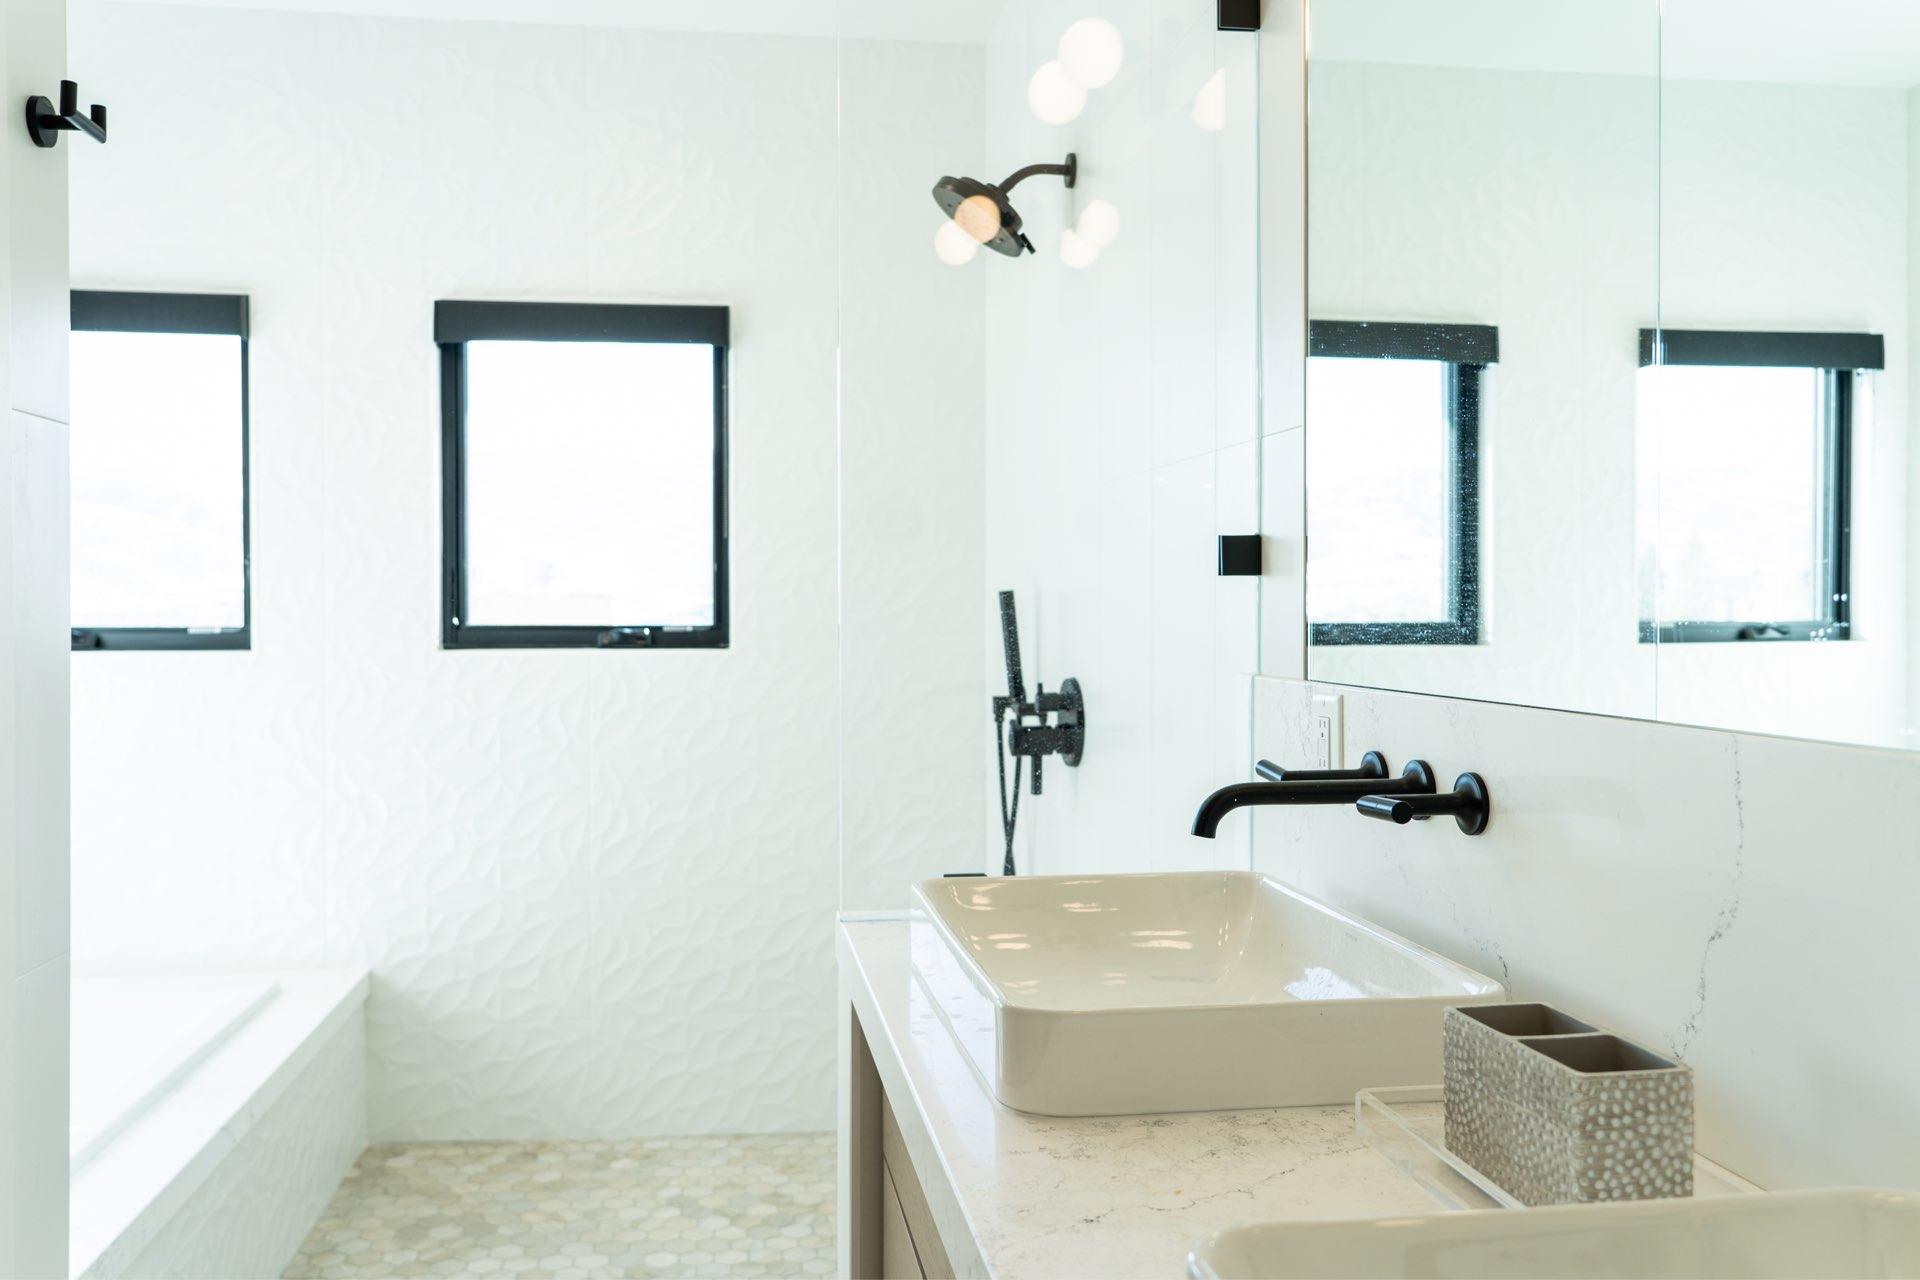 Bathroom, Larkspur Residence, architectural design by Elliott Workgroup